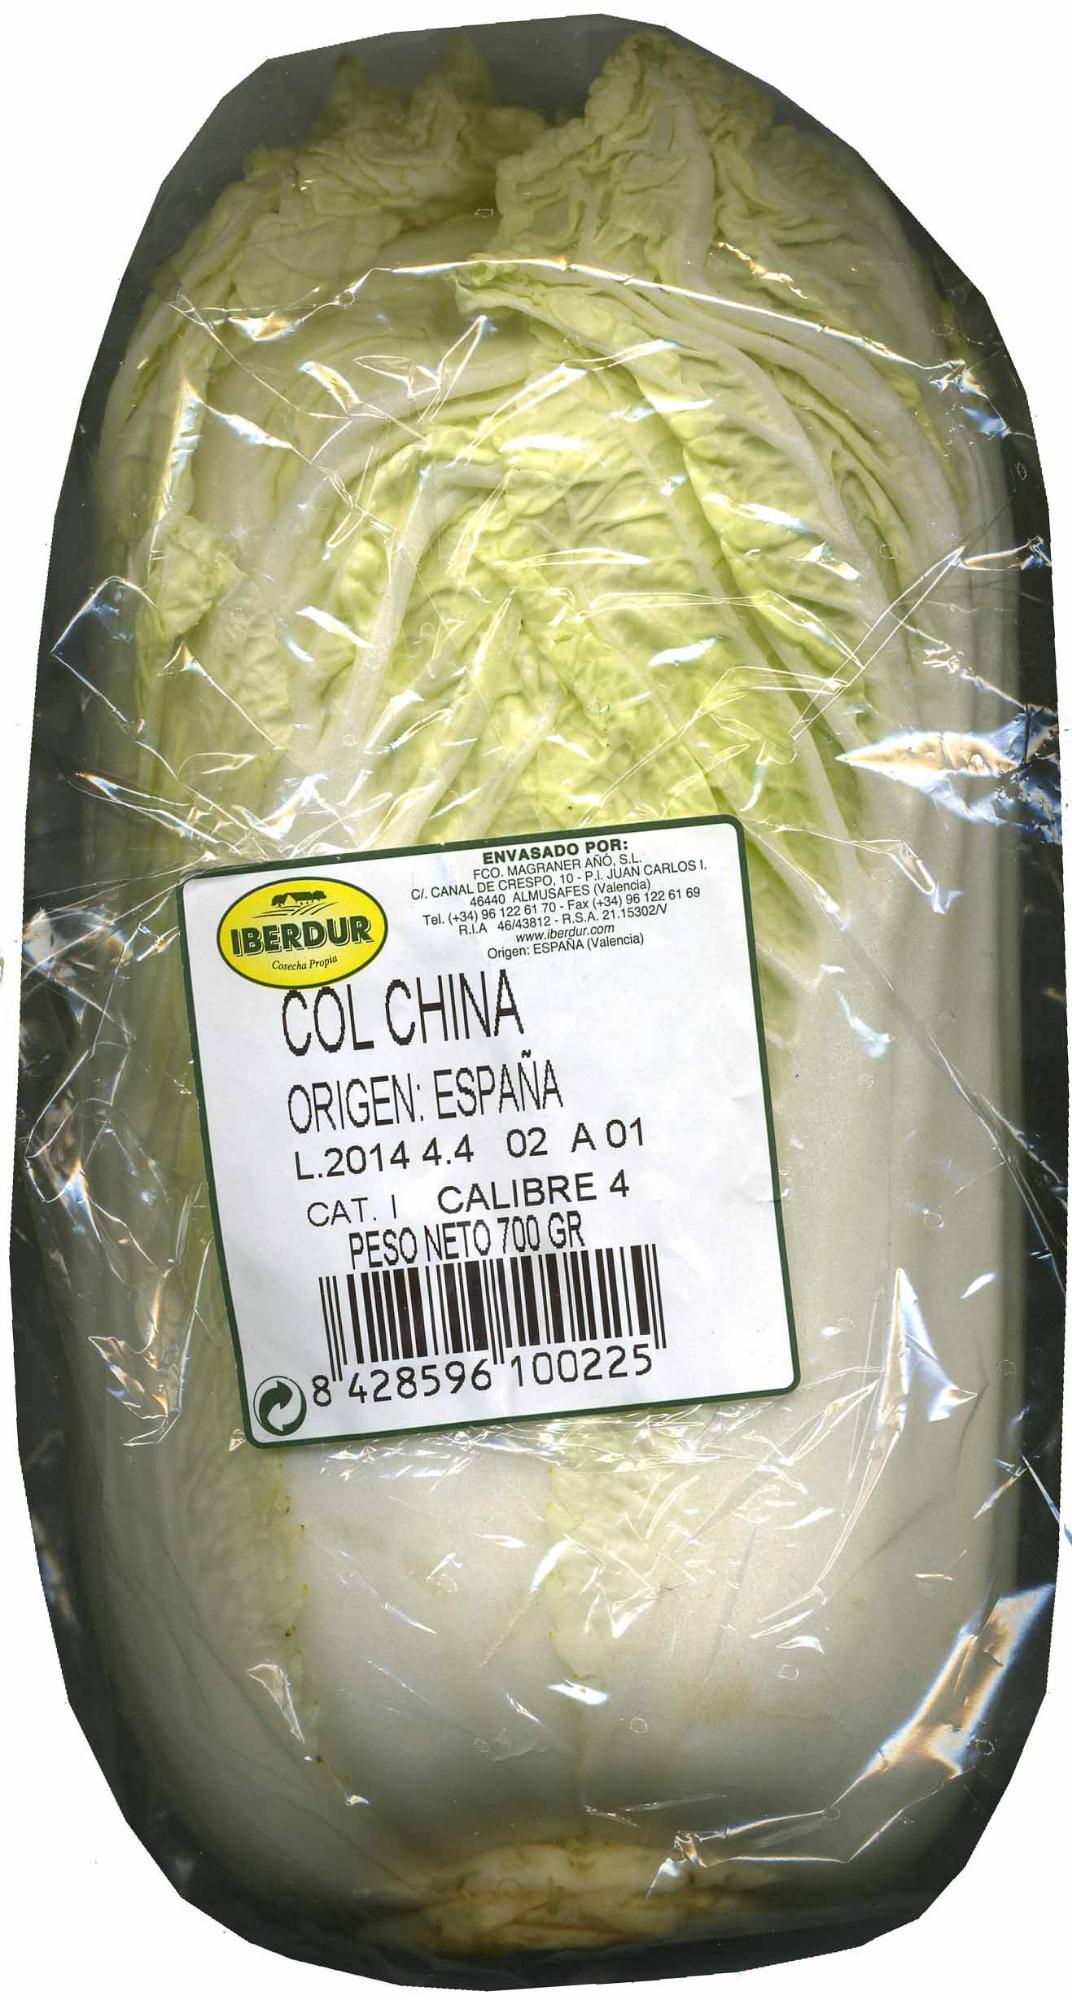 Col china - Produit - es